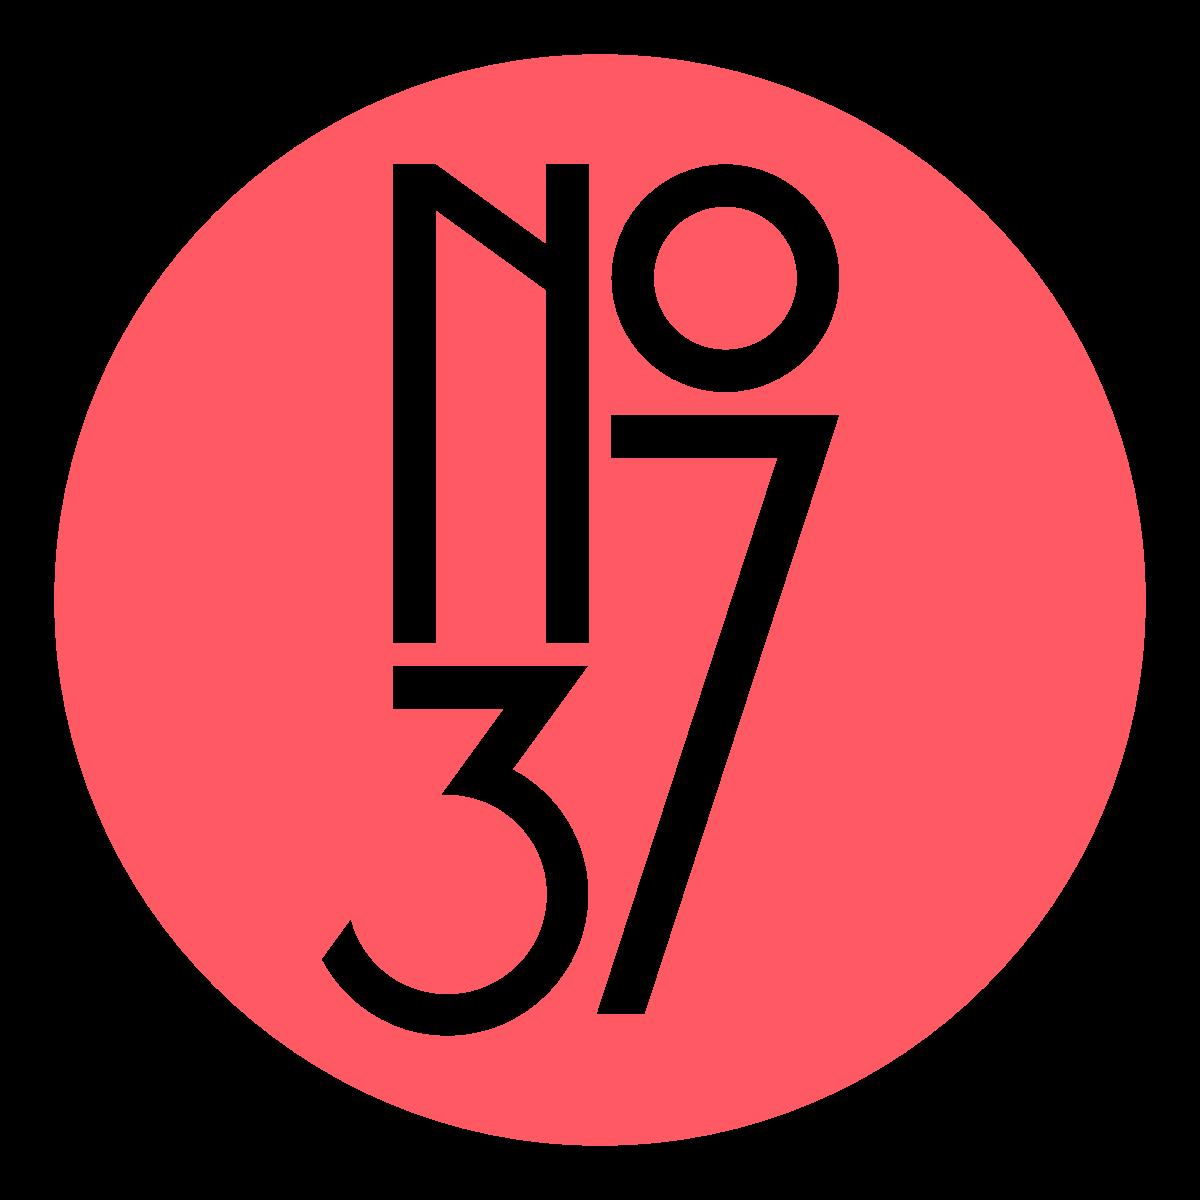 No. 37 Creatieve Concepten